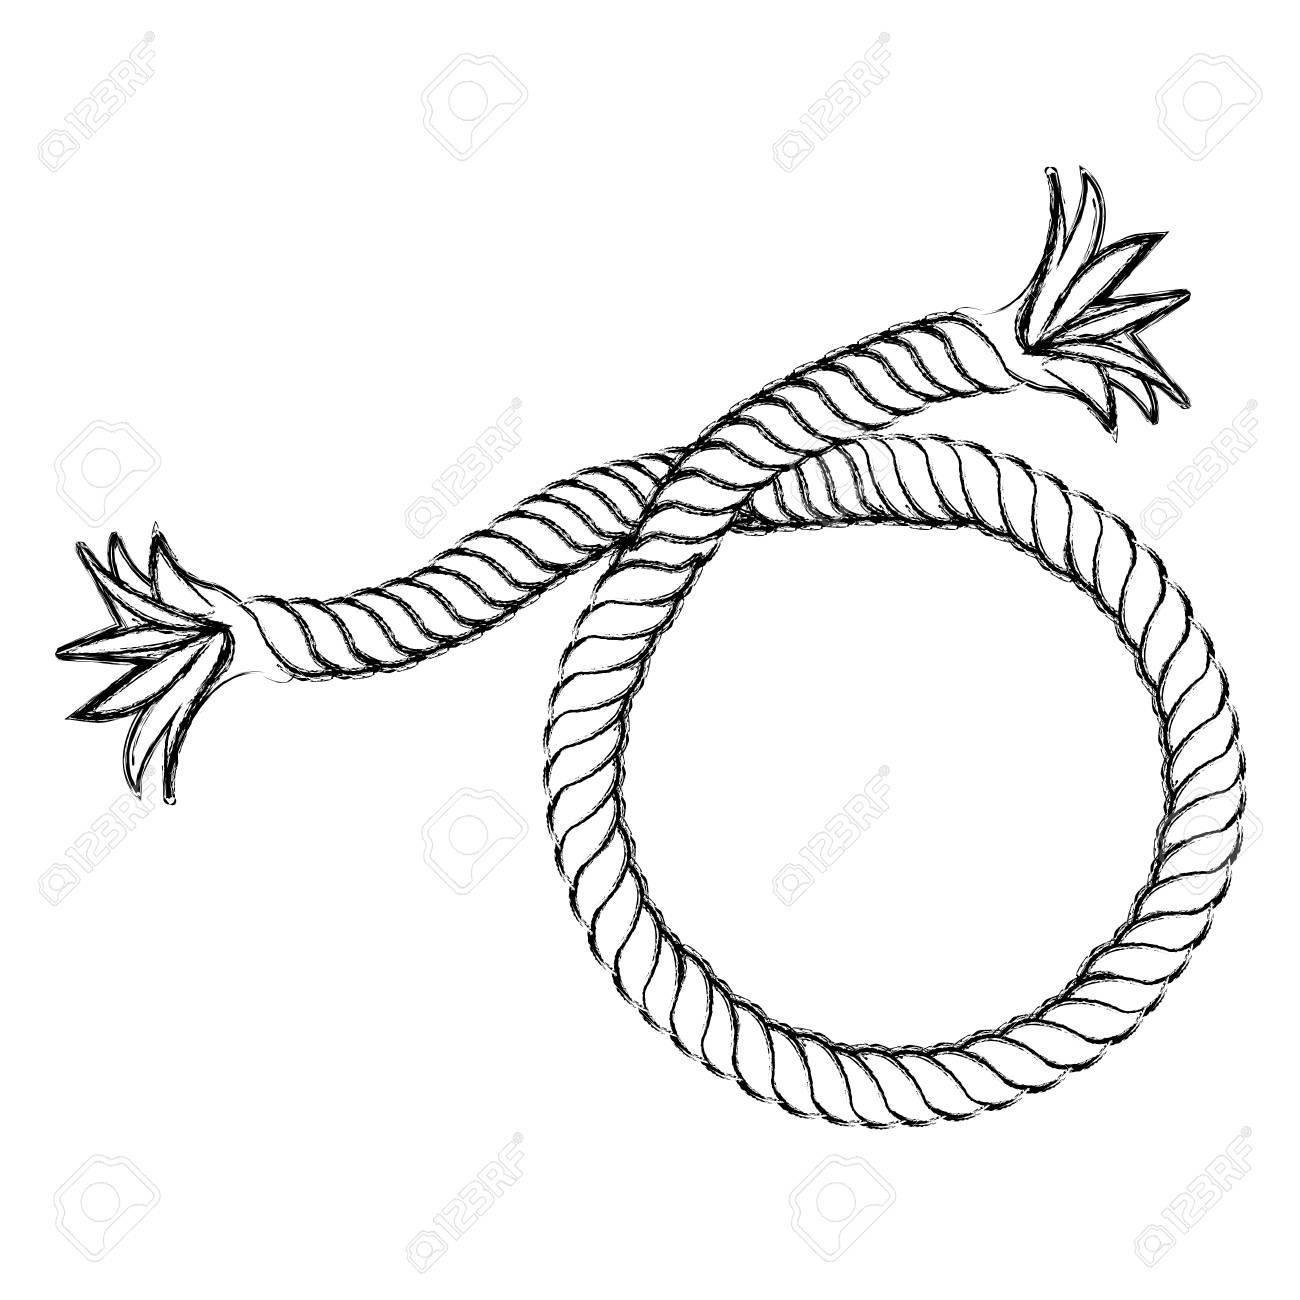 Rope Bridge Drawing